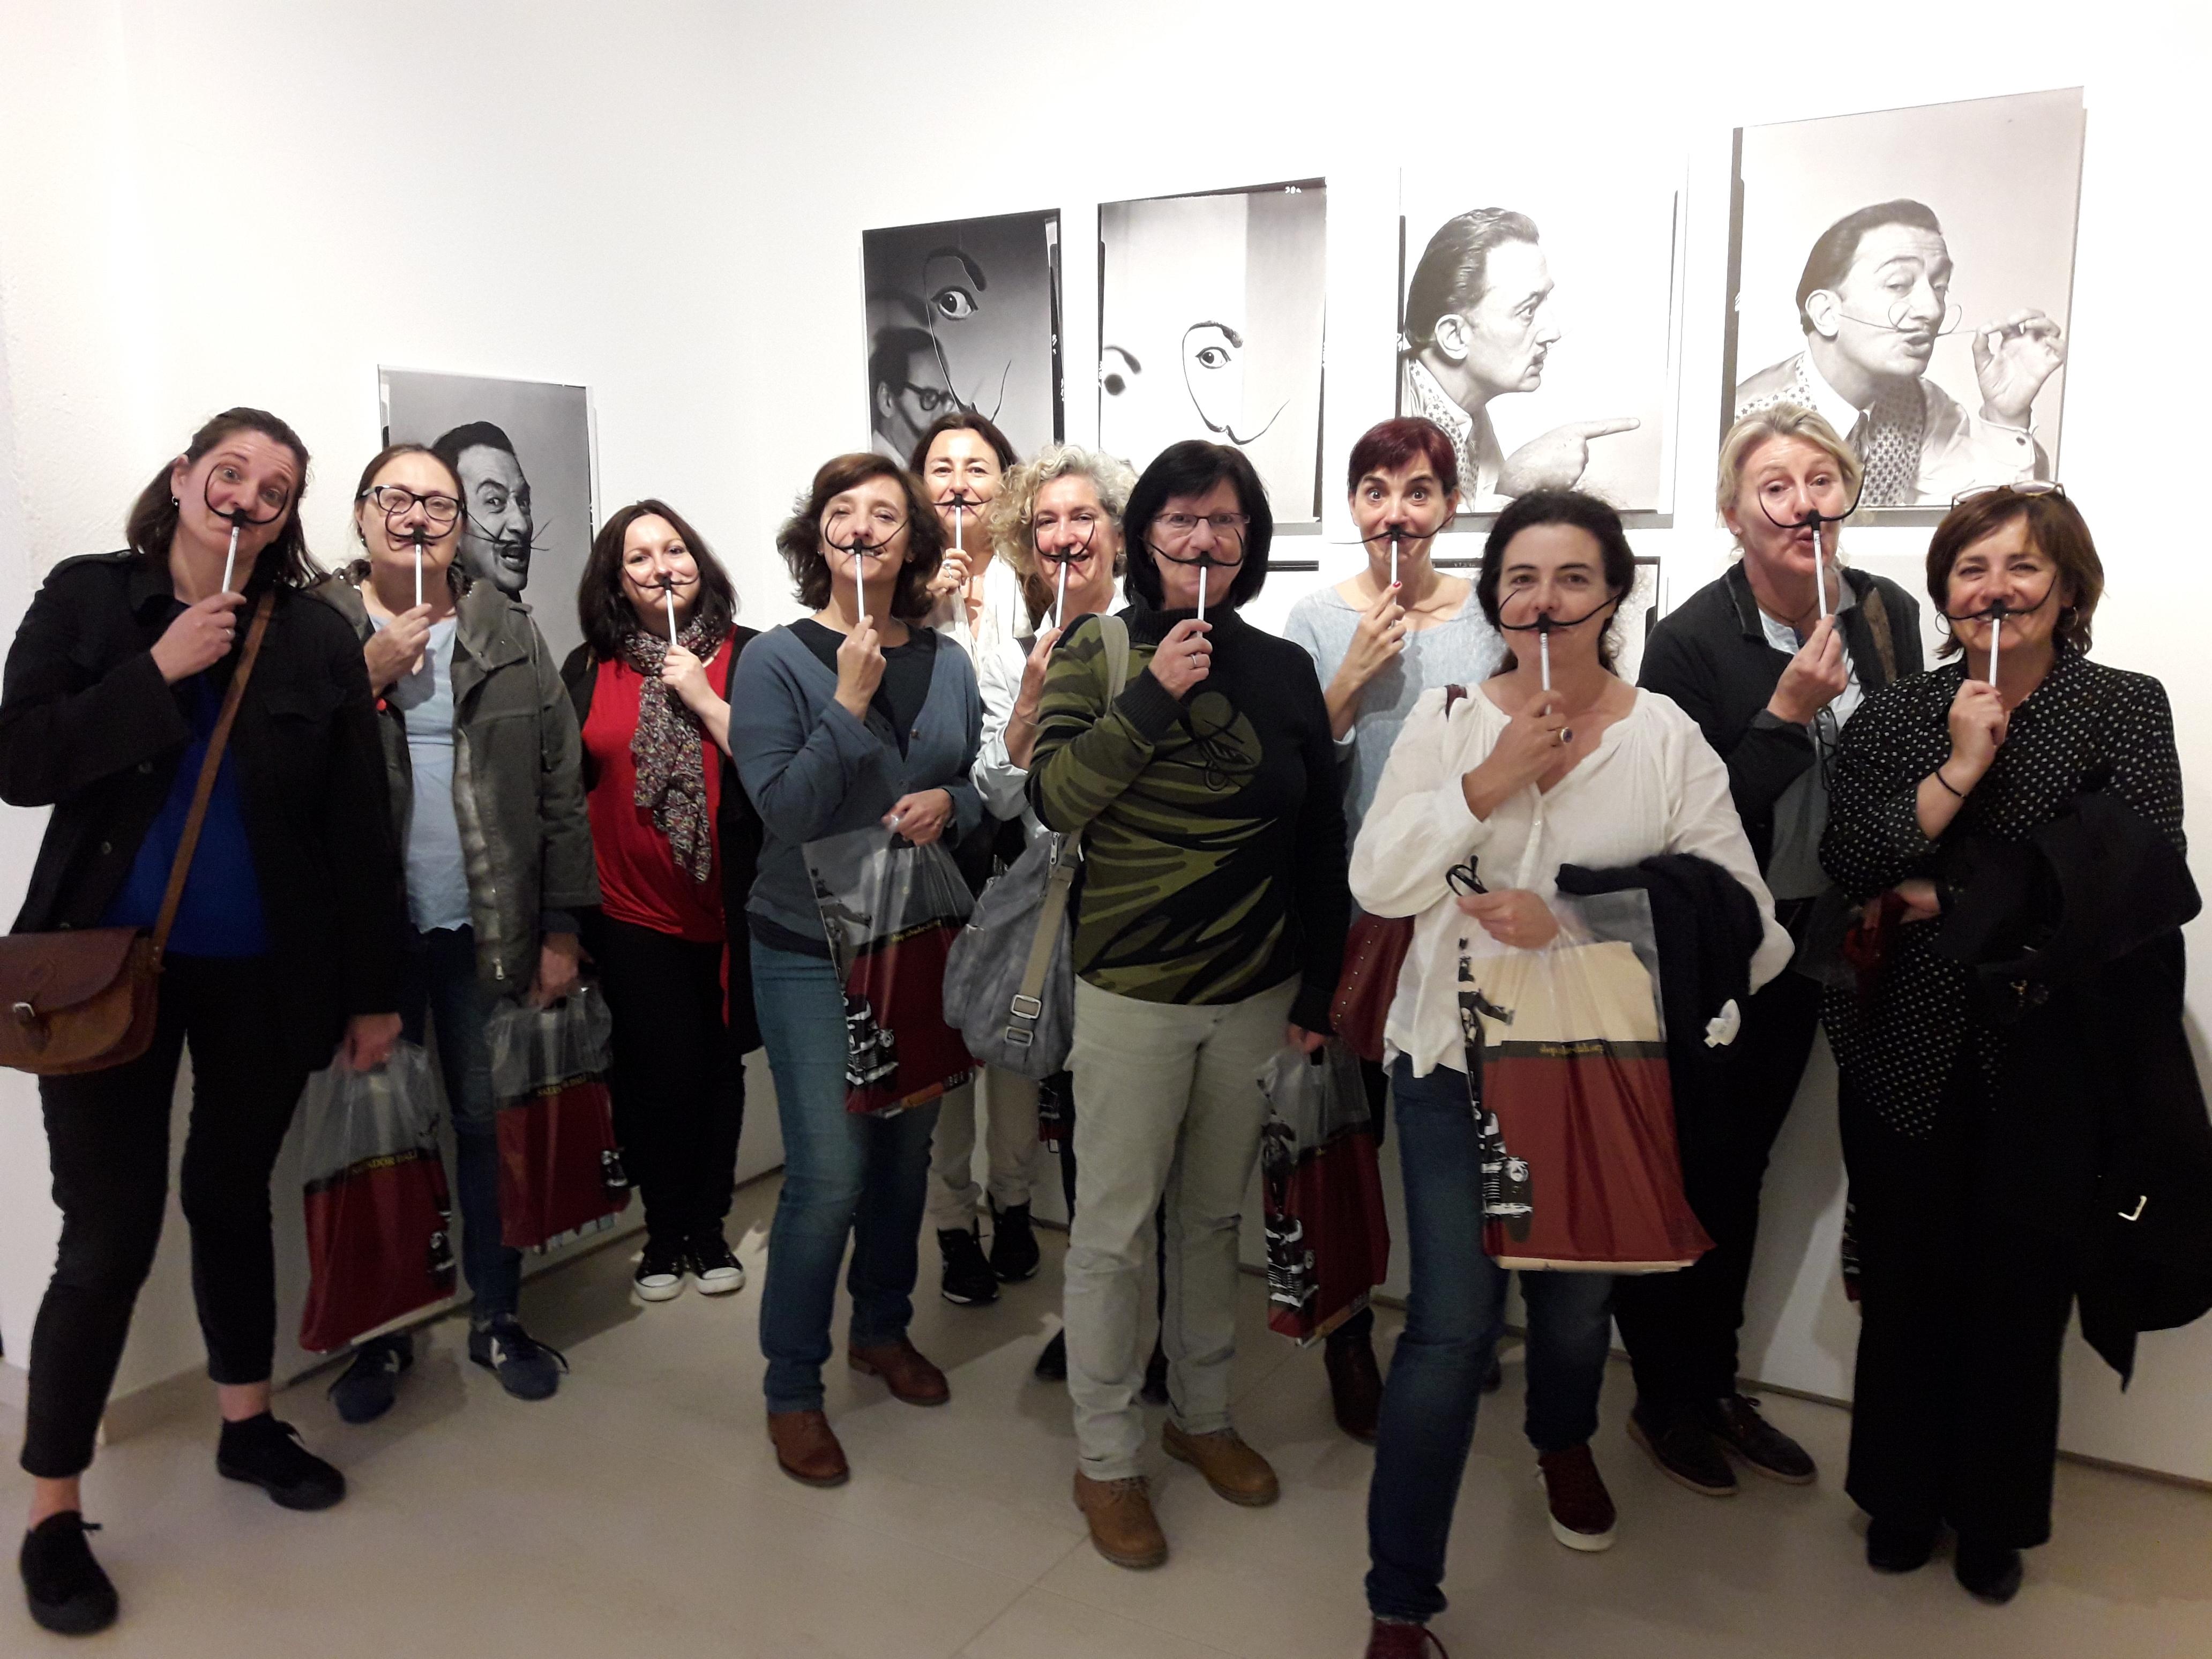 The team of the Gala-Salvador Dalí Foundation with the Museu Nacional team